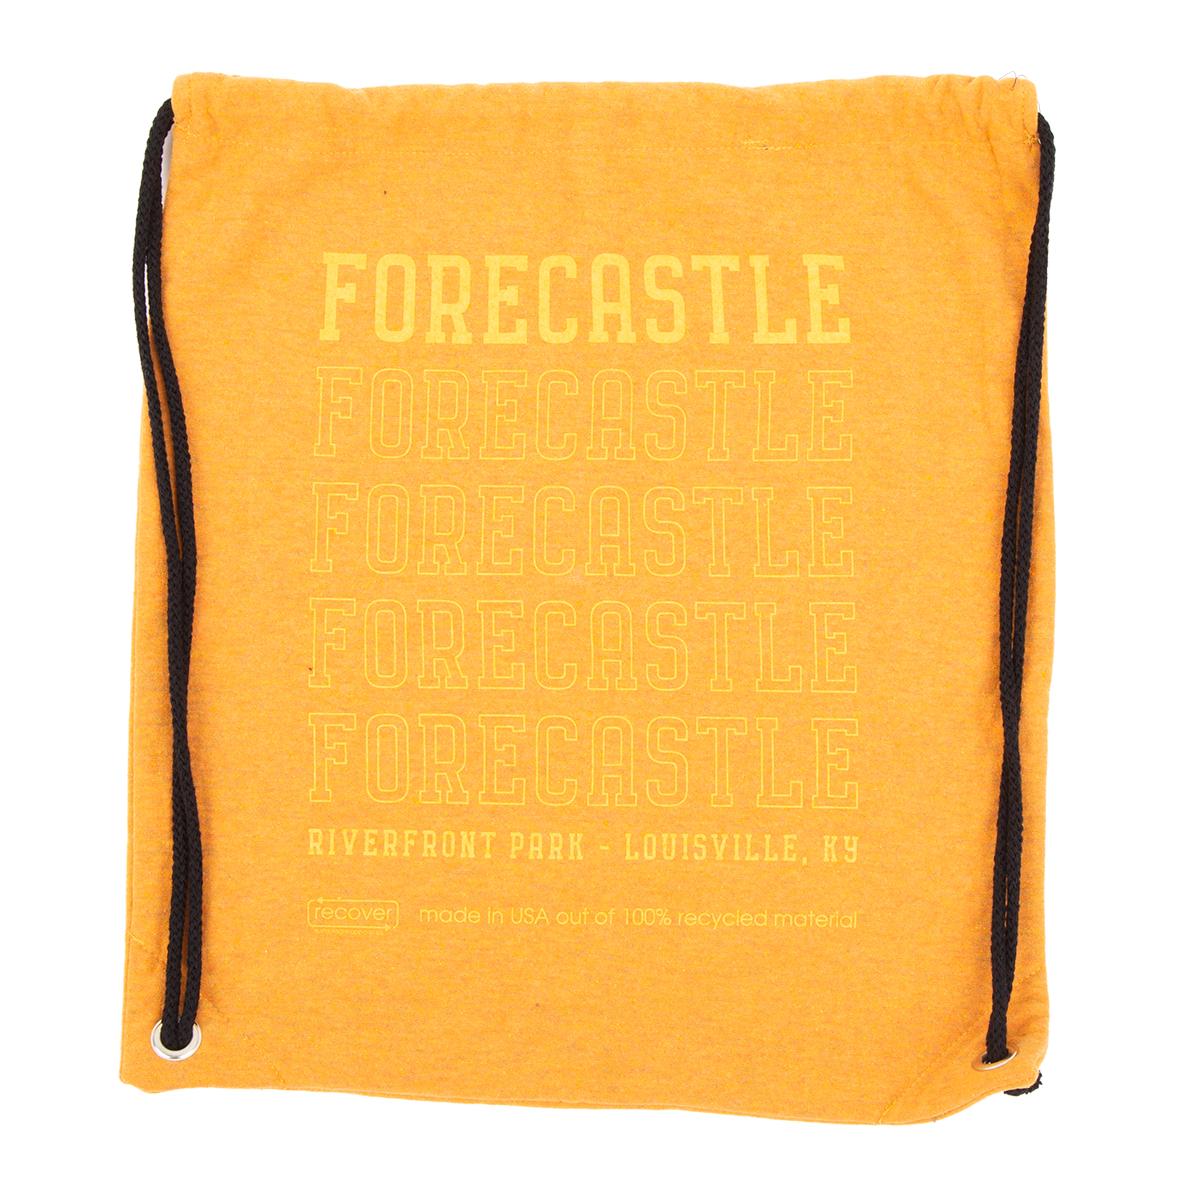 Forecastle 2019 Drawstring Bag - Orange